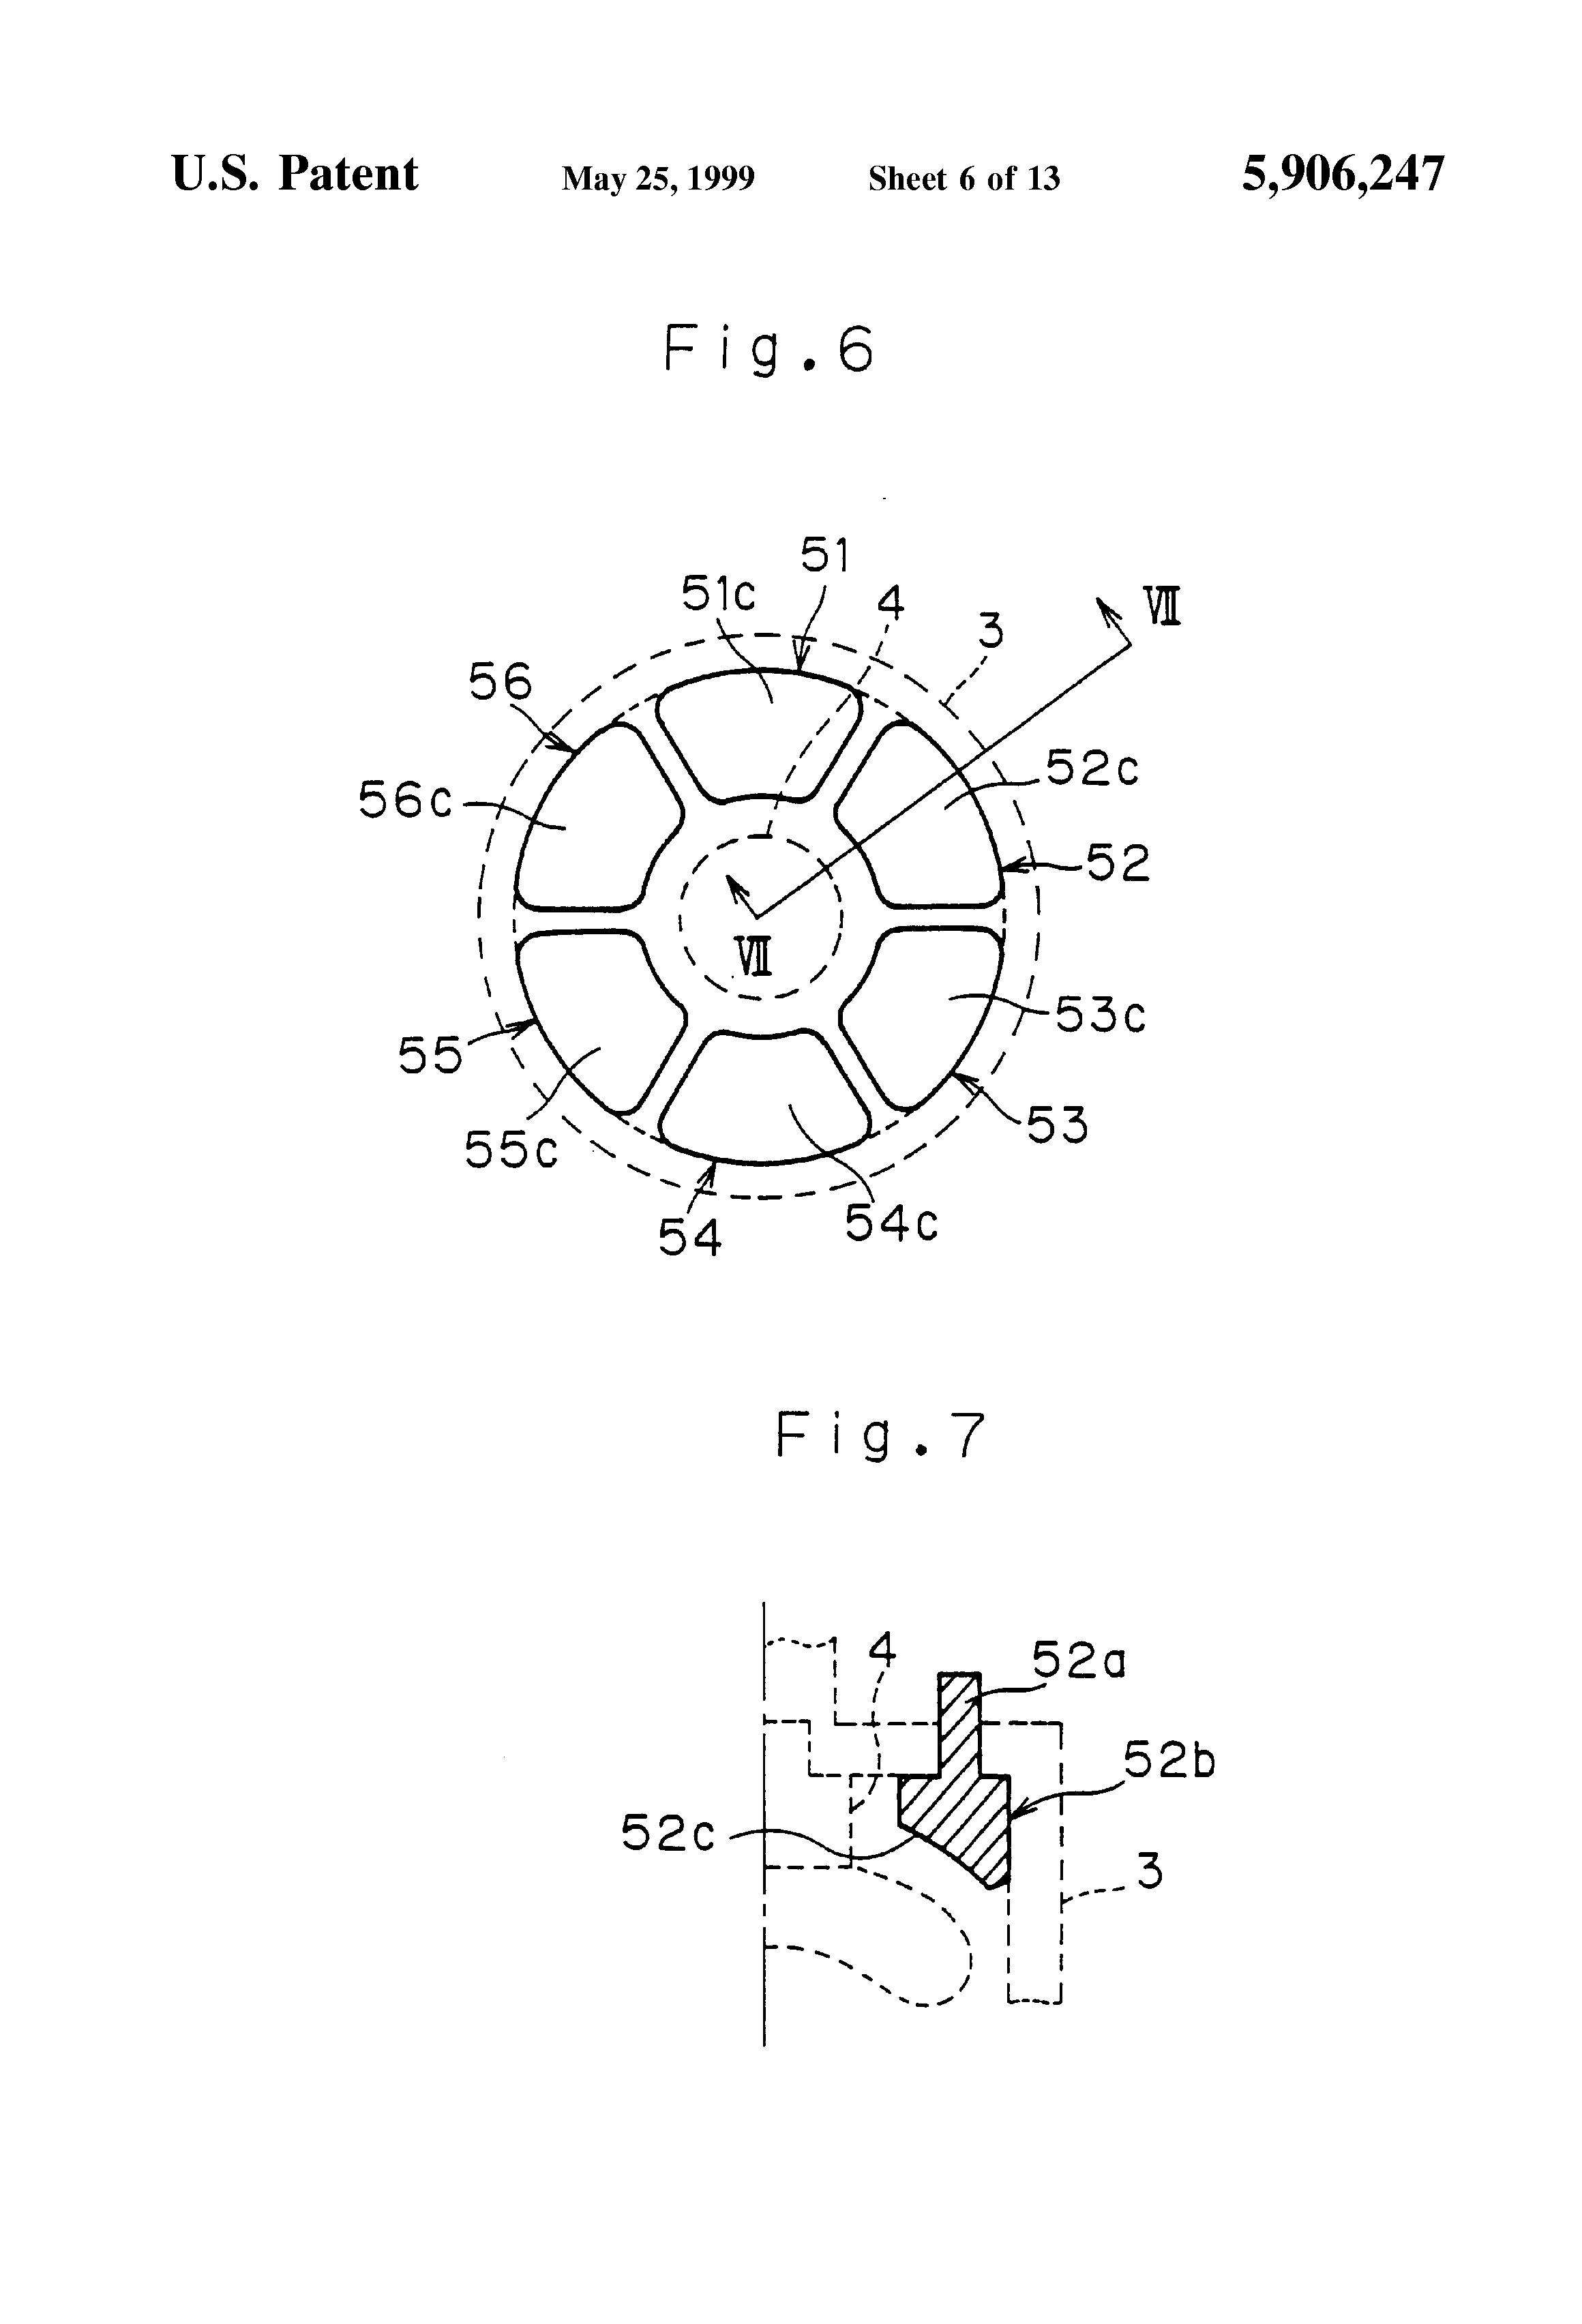 Rotork Actuator Wiring Diagram | Wiring Library